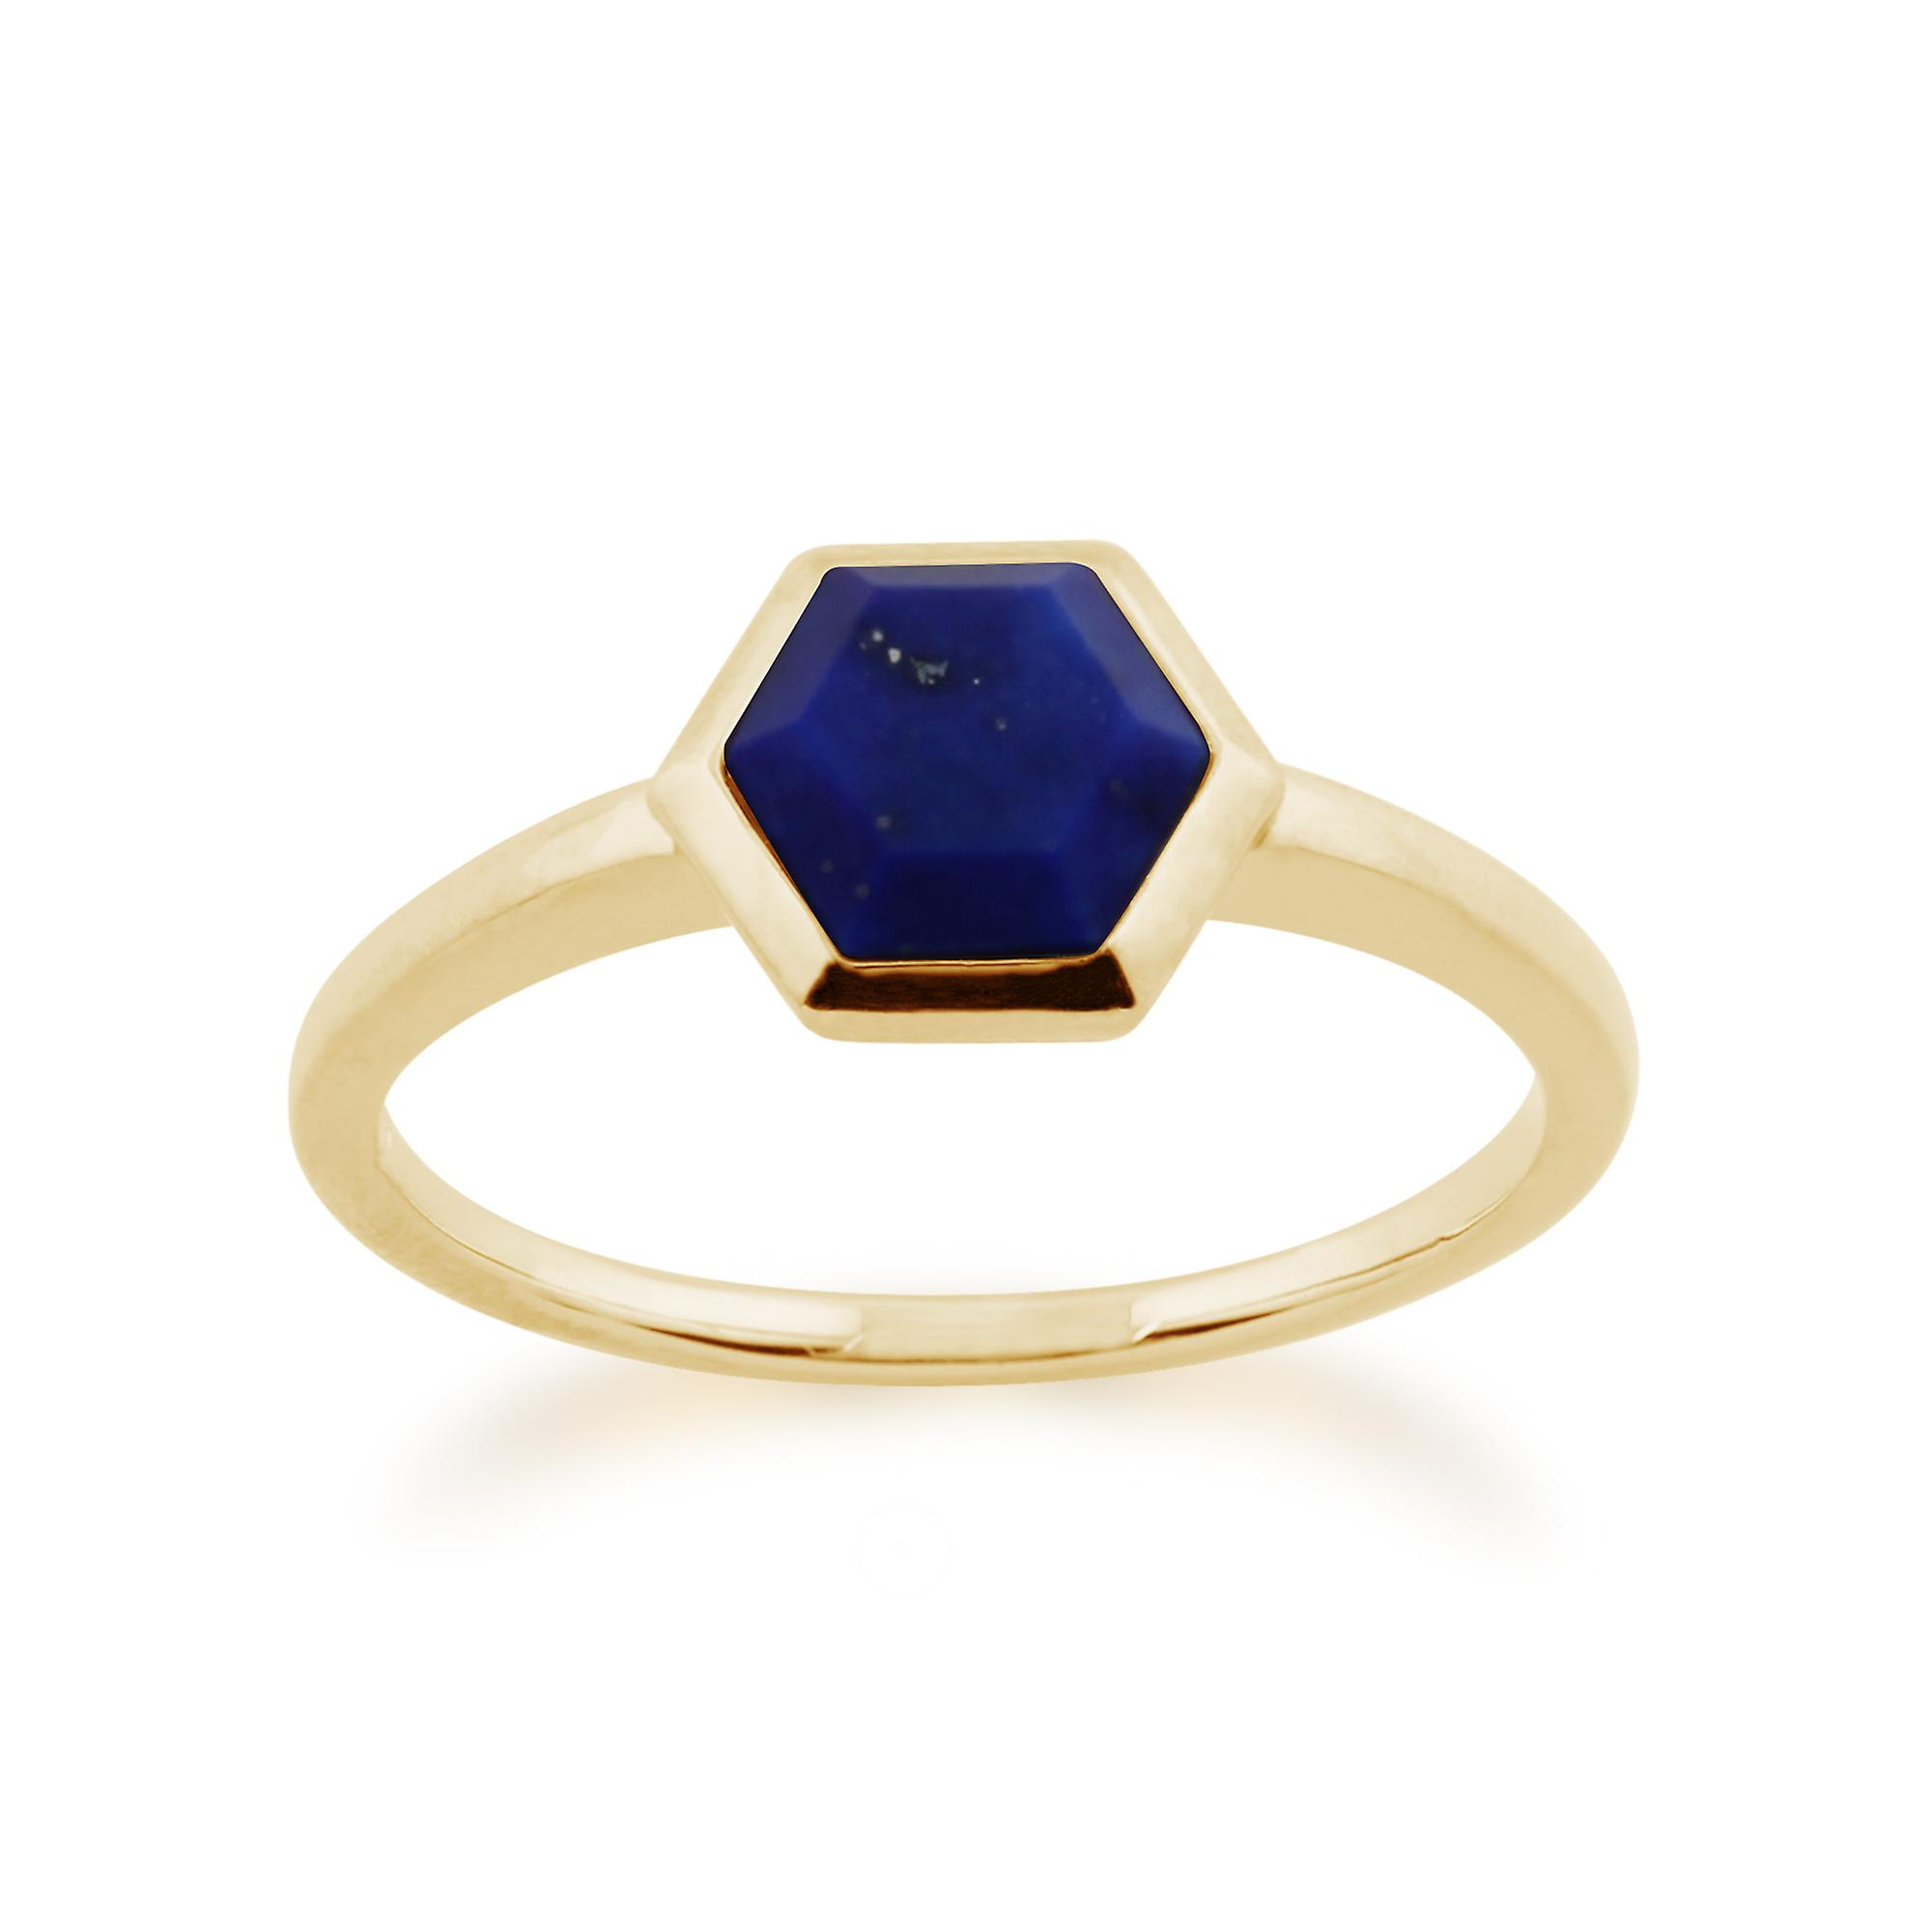 Gemondo 925 Gold Plated Sterling Silver 1.10ct Lapis Lazuli Hexagonal Prism Ring